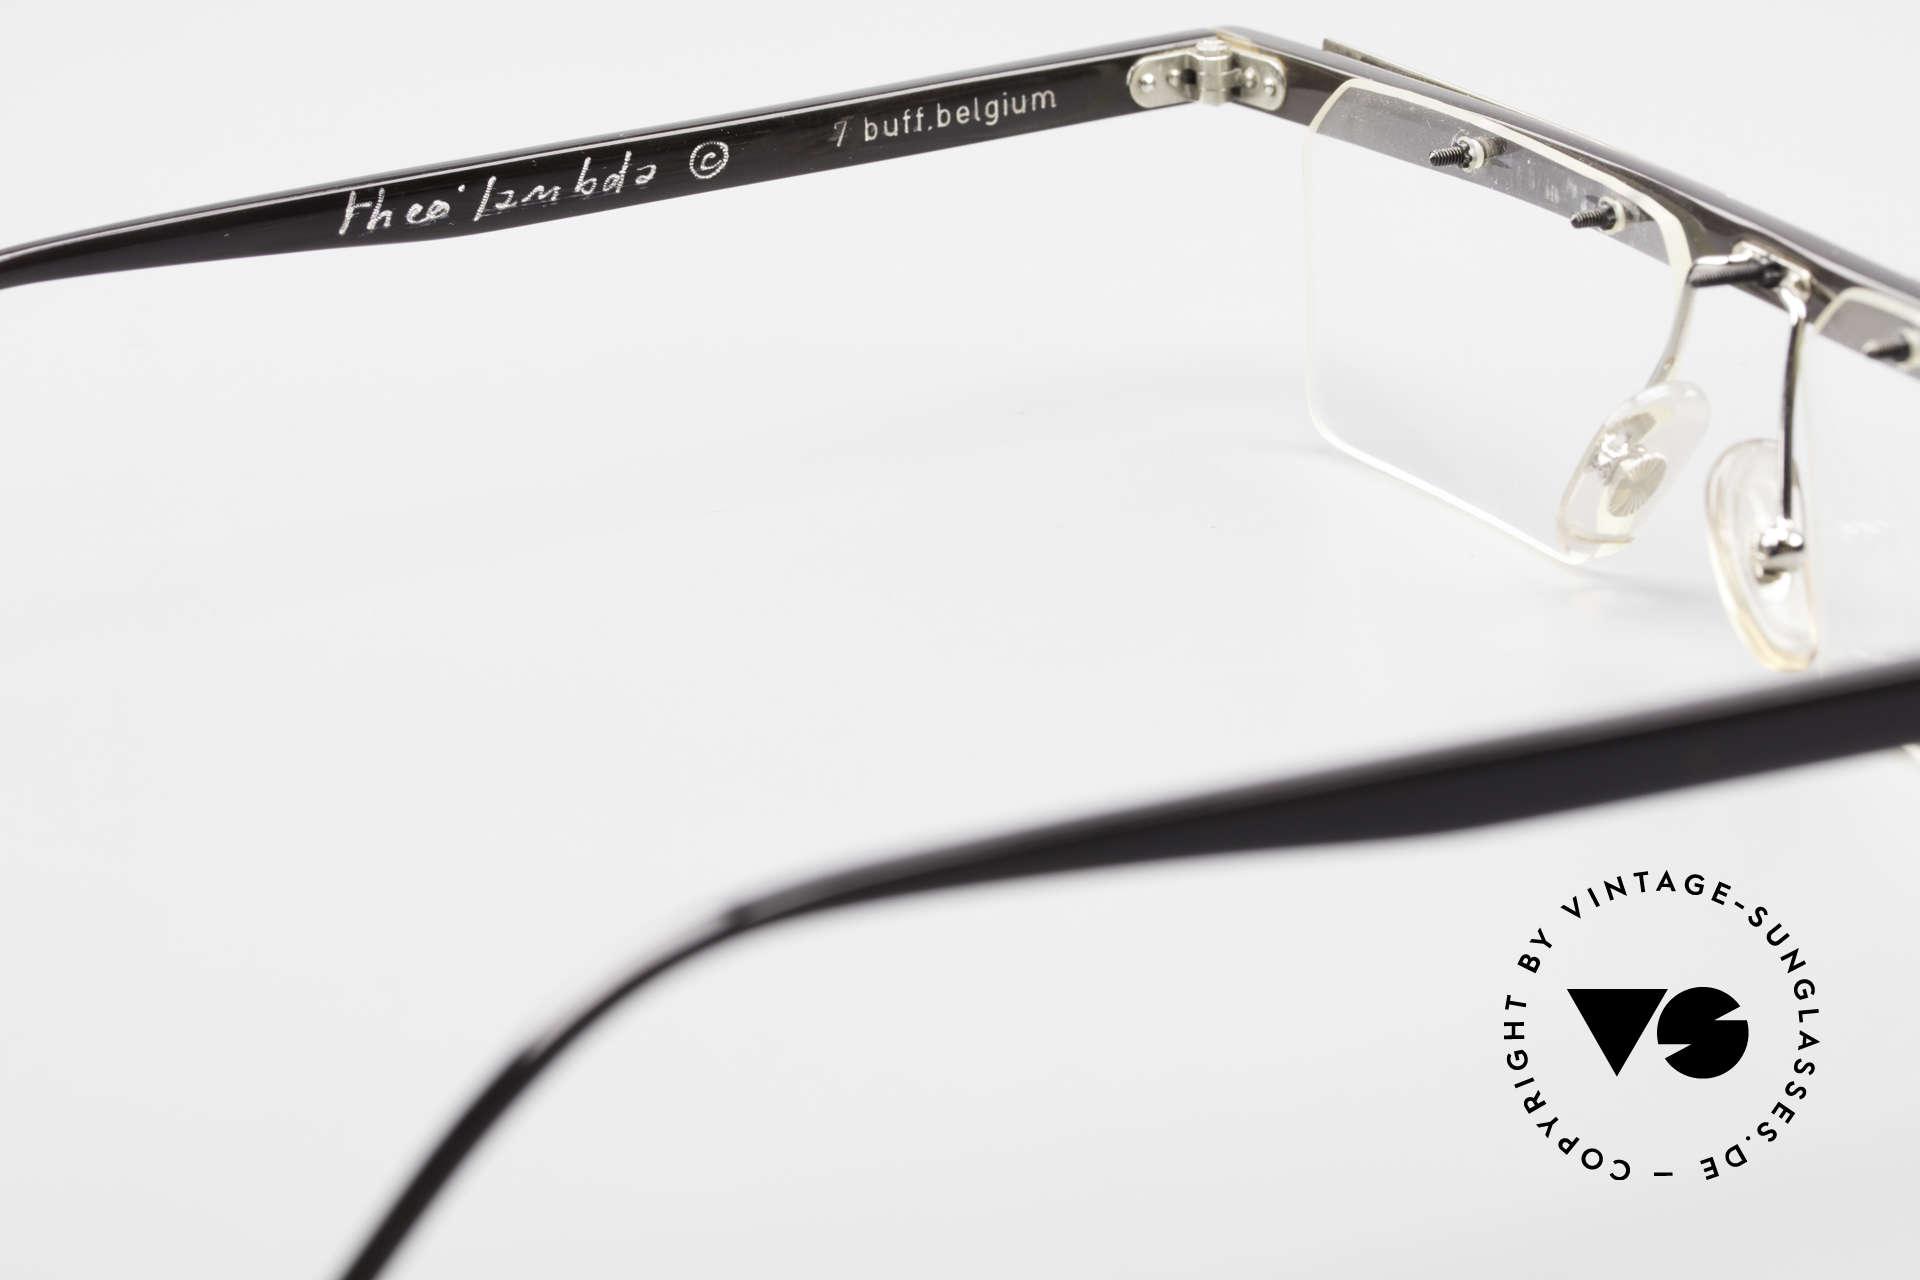 Theo Belgium Lambeta 7 Genuine Buffalo Horn Frame, so to speak: vintage eyeglasses with representativeness, Made for Men